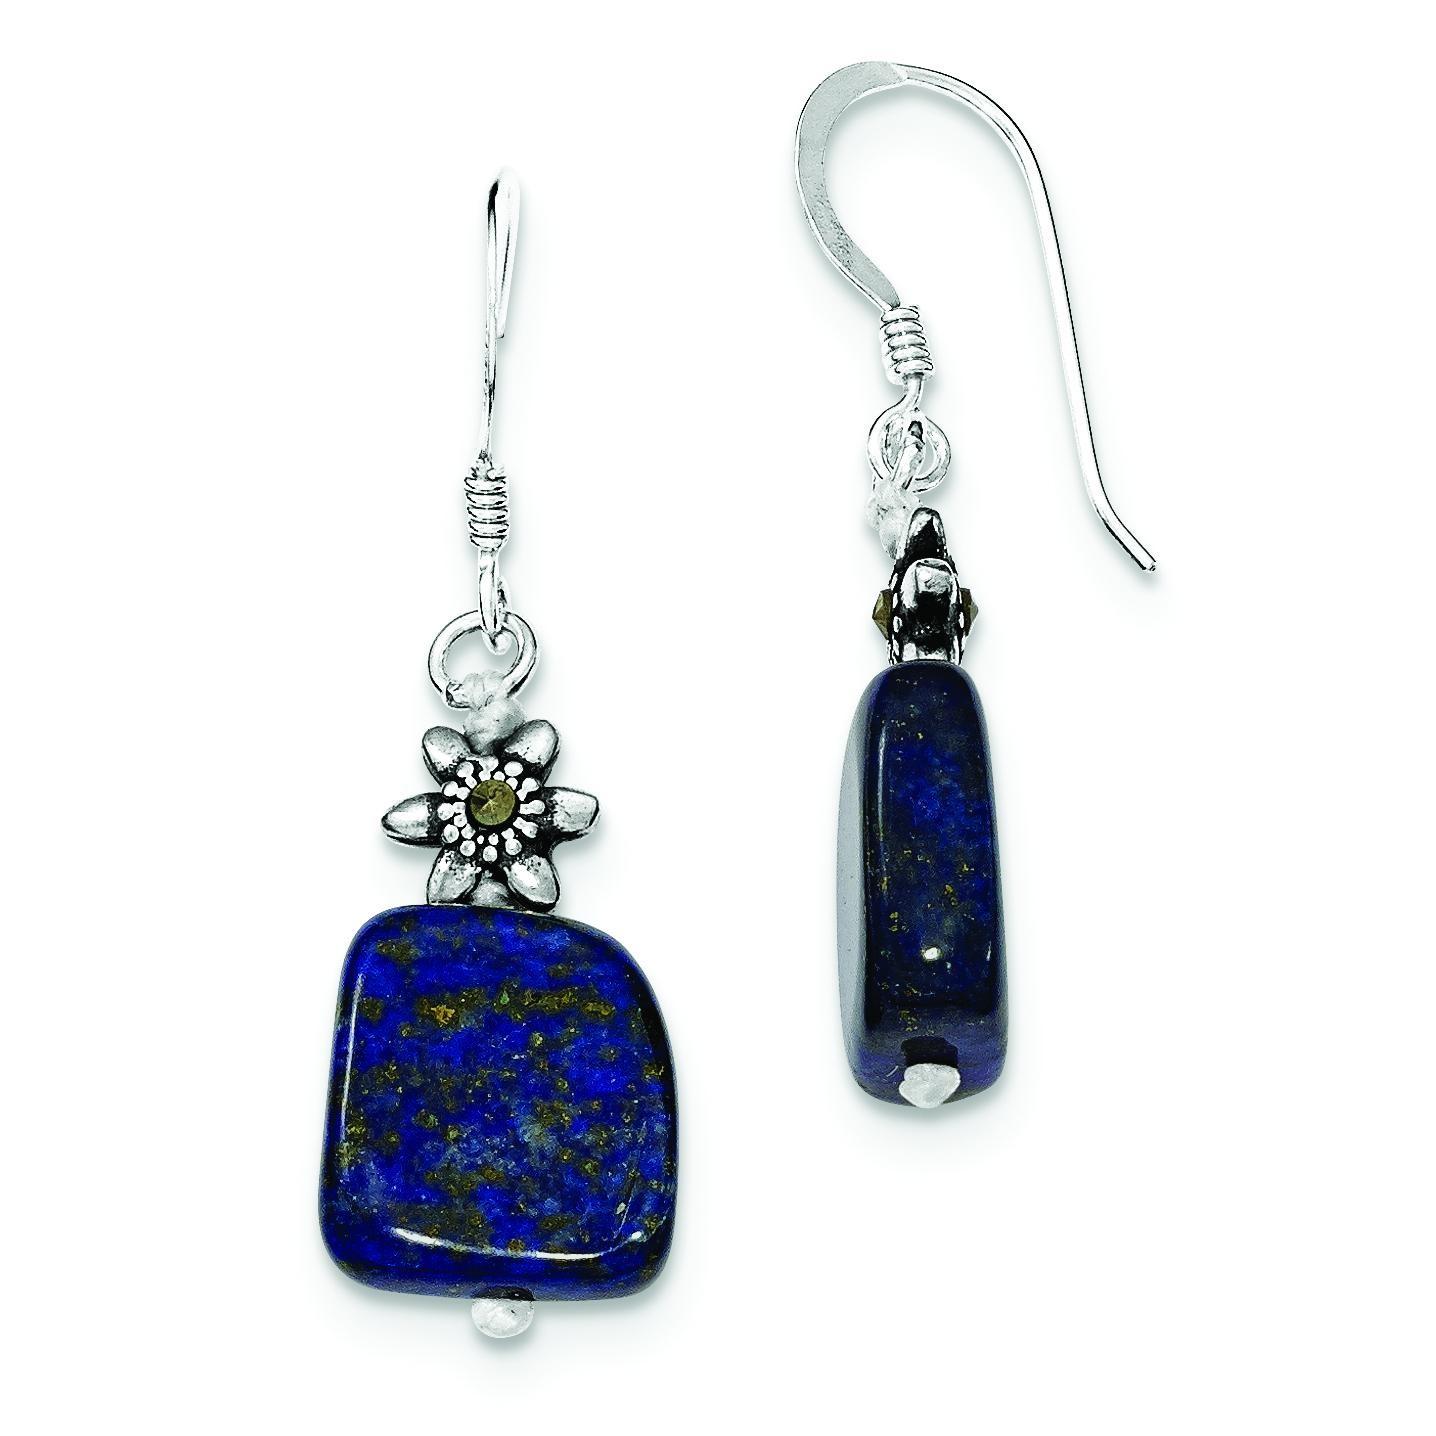 Lapis Marcasite Earrings in Sterling Silver